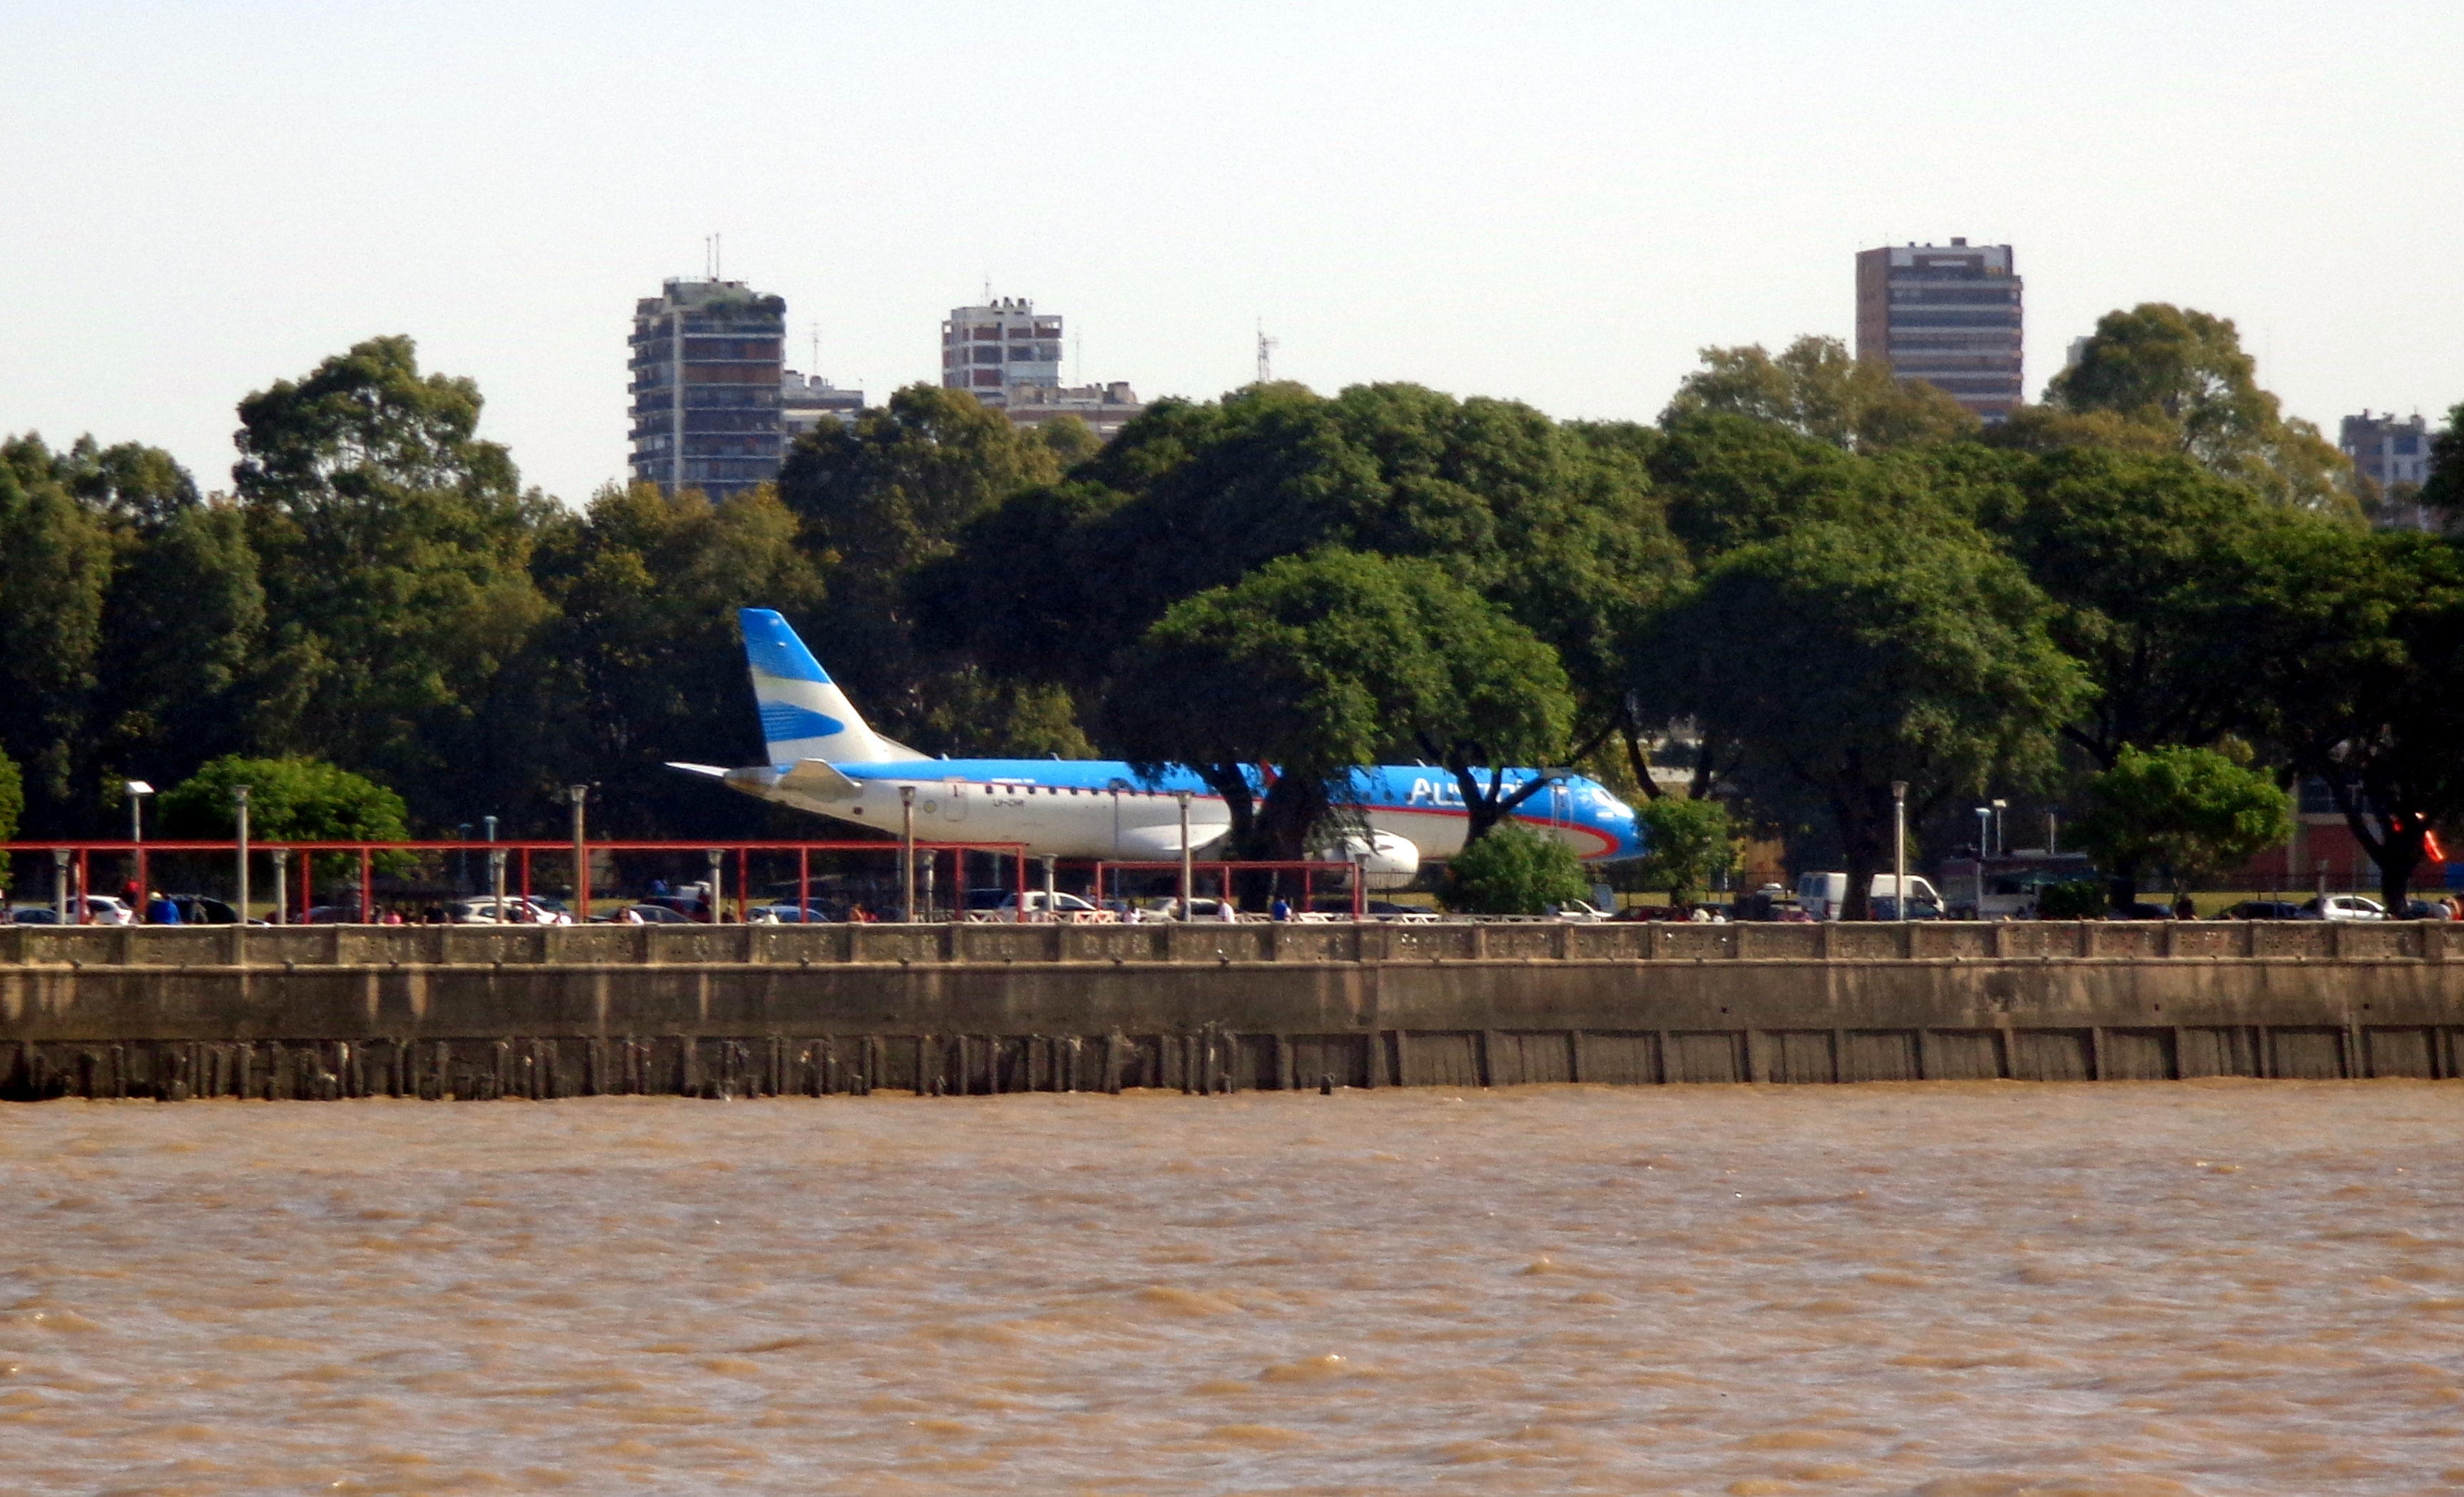 https://upload.wikimedia.org/wikipedia/commons/c/c5/Aerol%C3%ADnea_Austral_Aeroparque_Jorge_Newbery.JPG